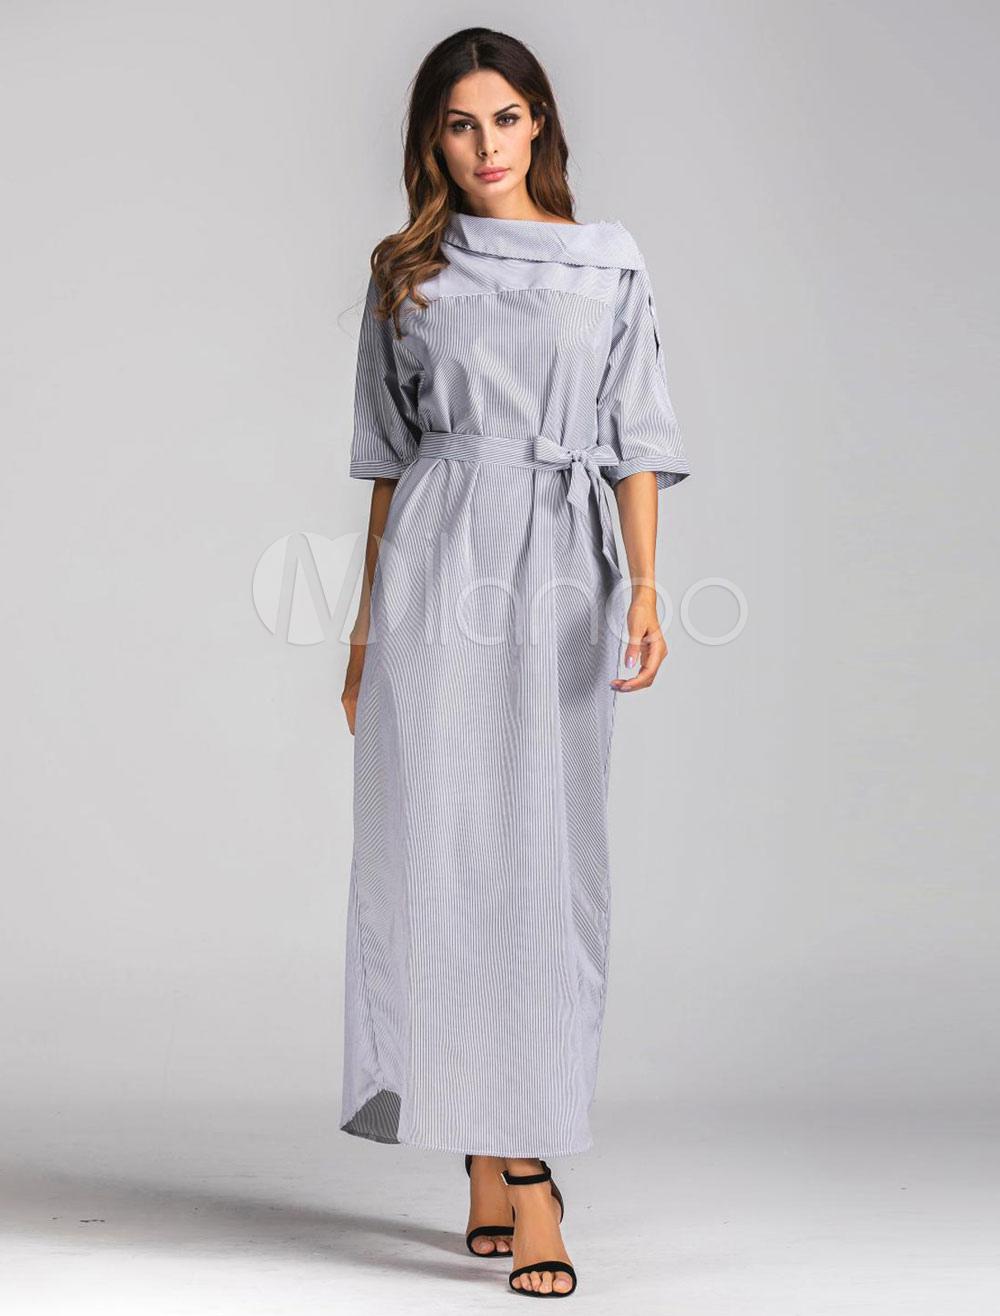 Women's Long Dress Asymmetrical Collar Striped Half Sleeve Light Grey Maxi Dresses